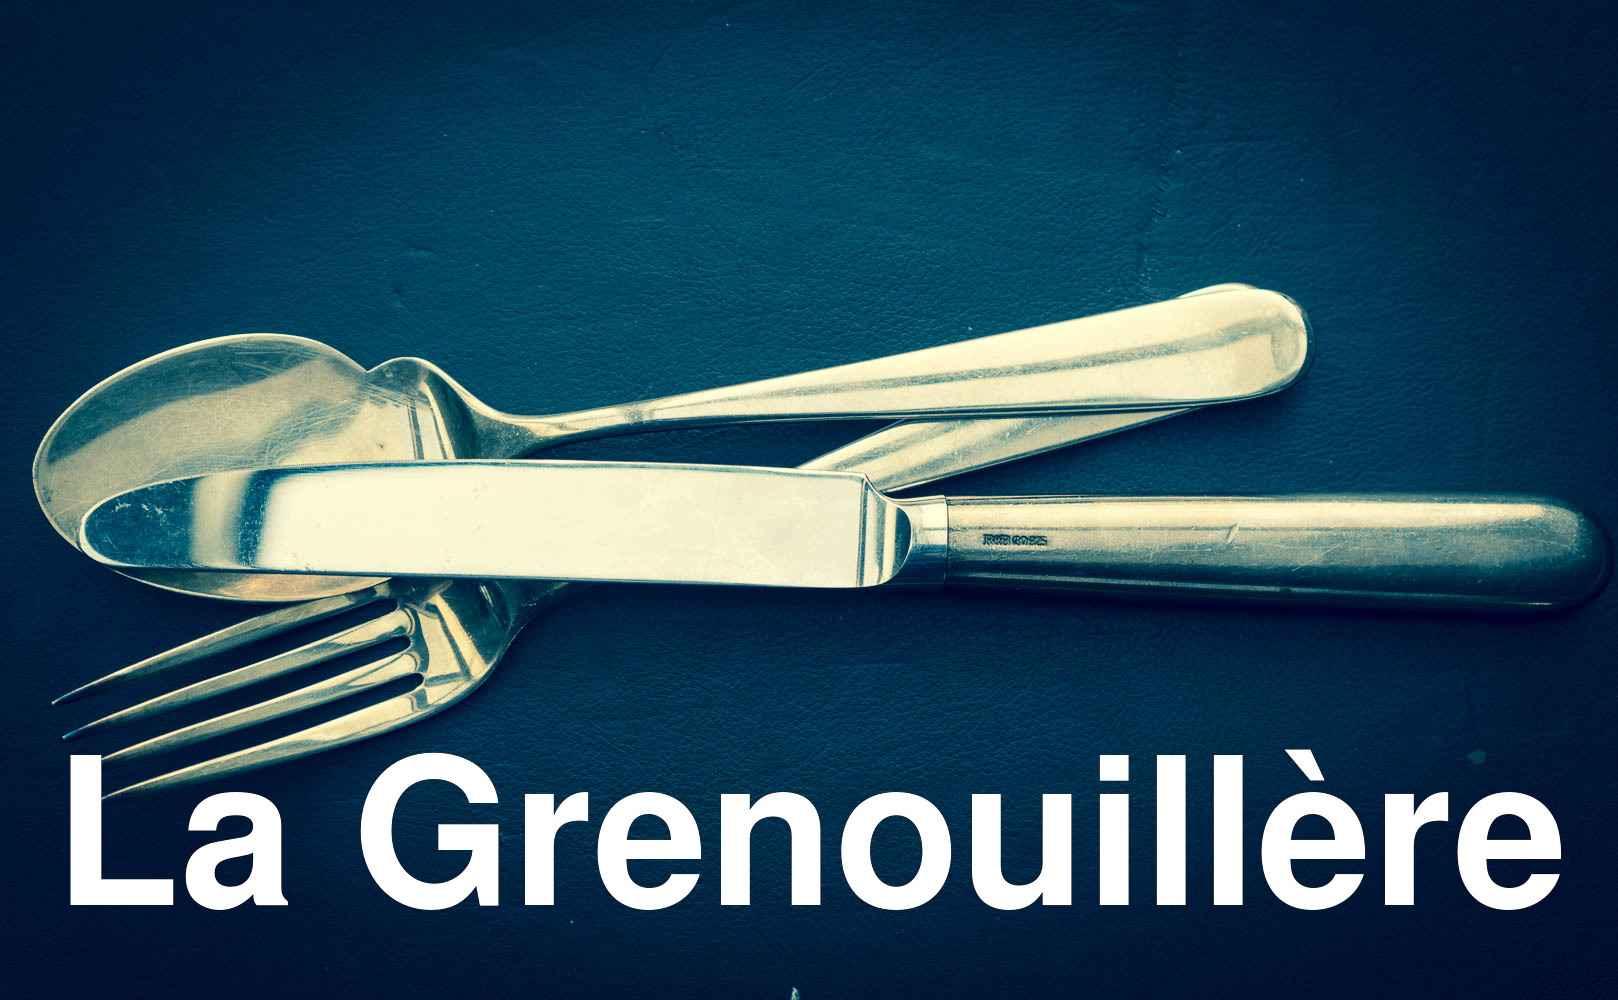 Restaurantkritik: La Grenouillère in Madelaine-sur-Montreuil, Frankreich,